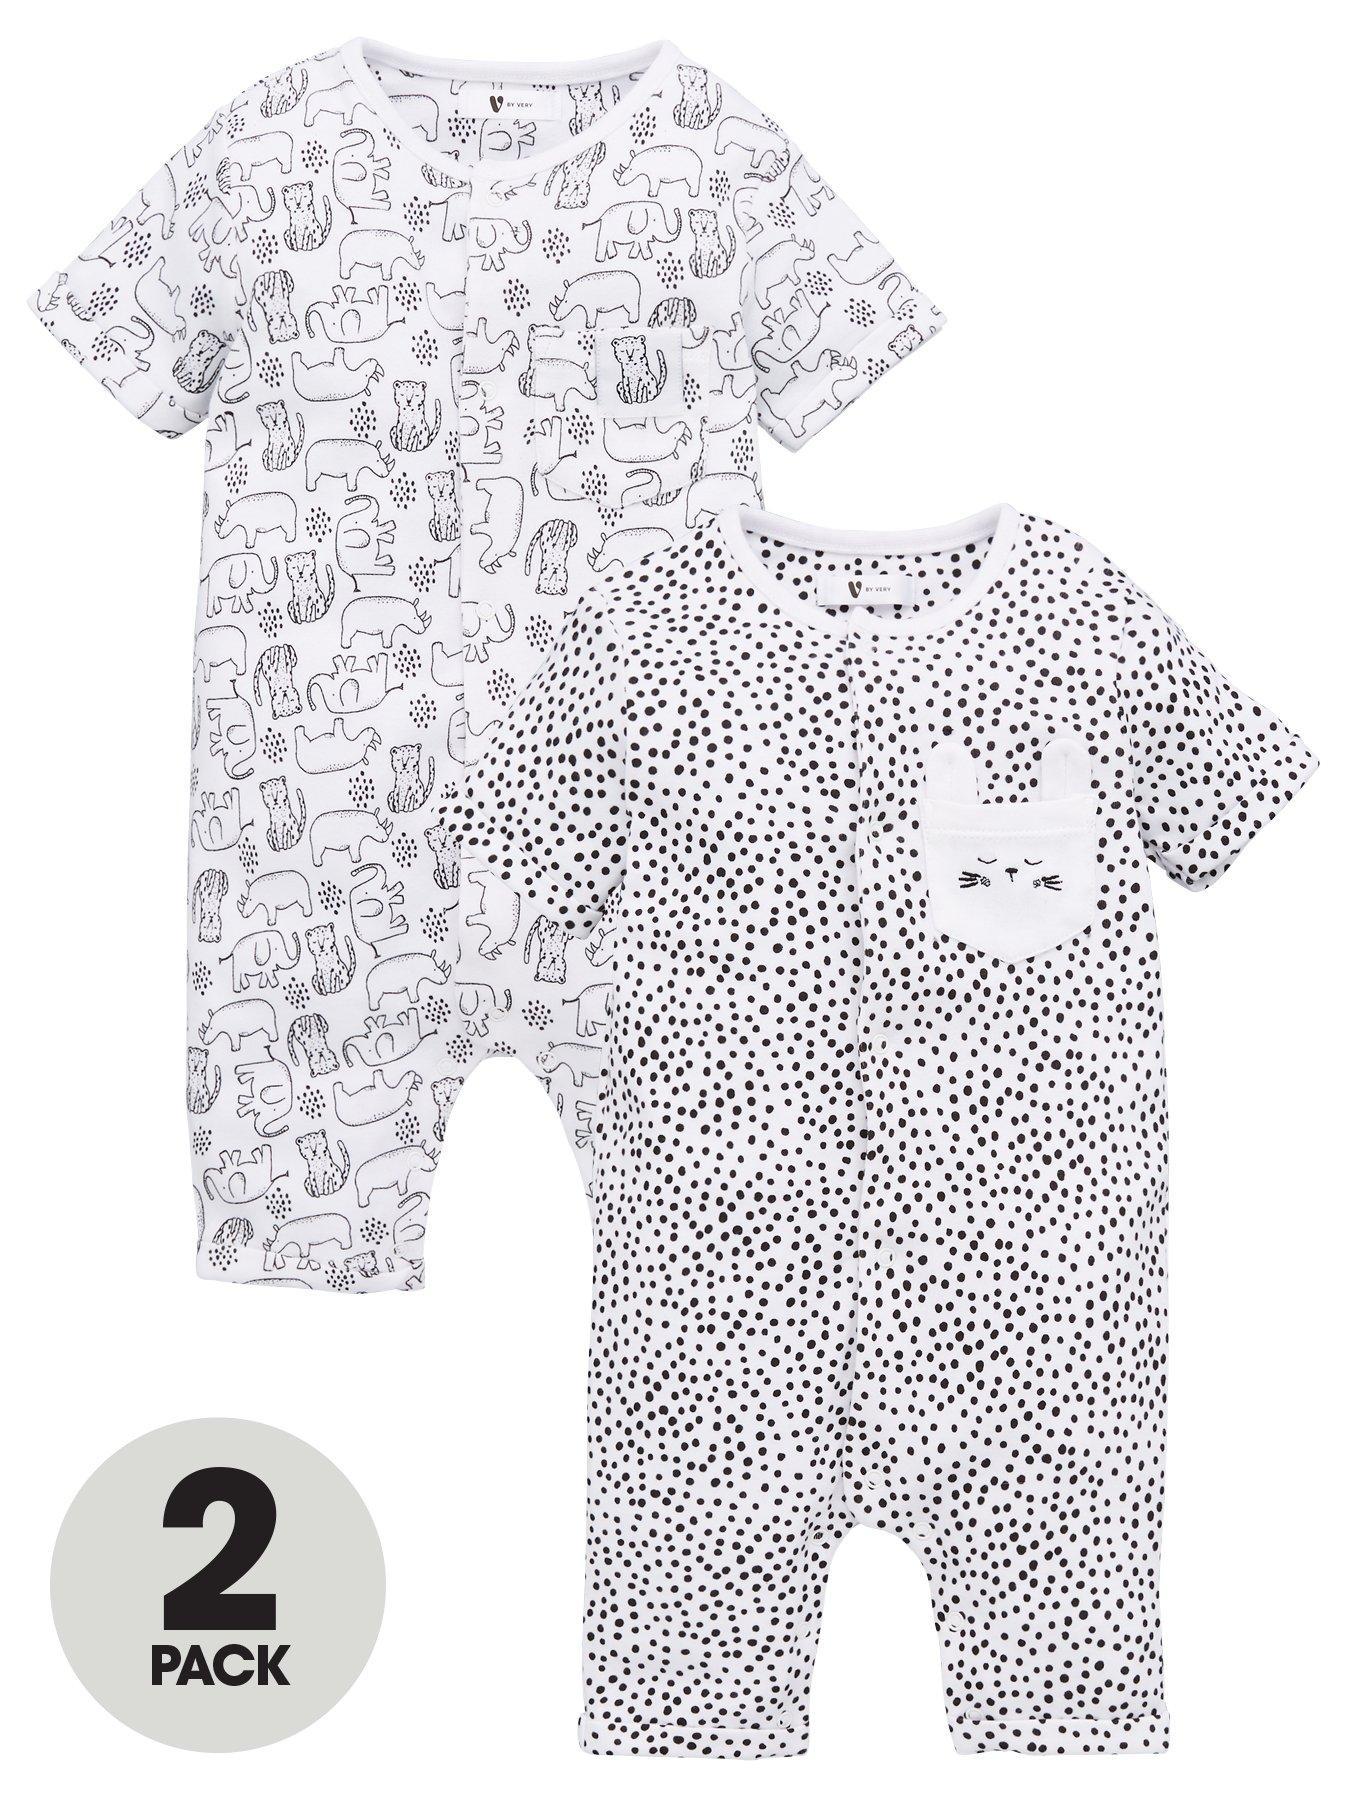 Baby Sleepsuit Baby Rompersuit Baby Jumpsuit Newborn Grey SR Baby Romper Best Baby Ever Baby Rompersuit with Feet